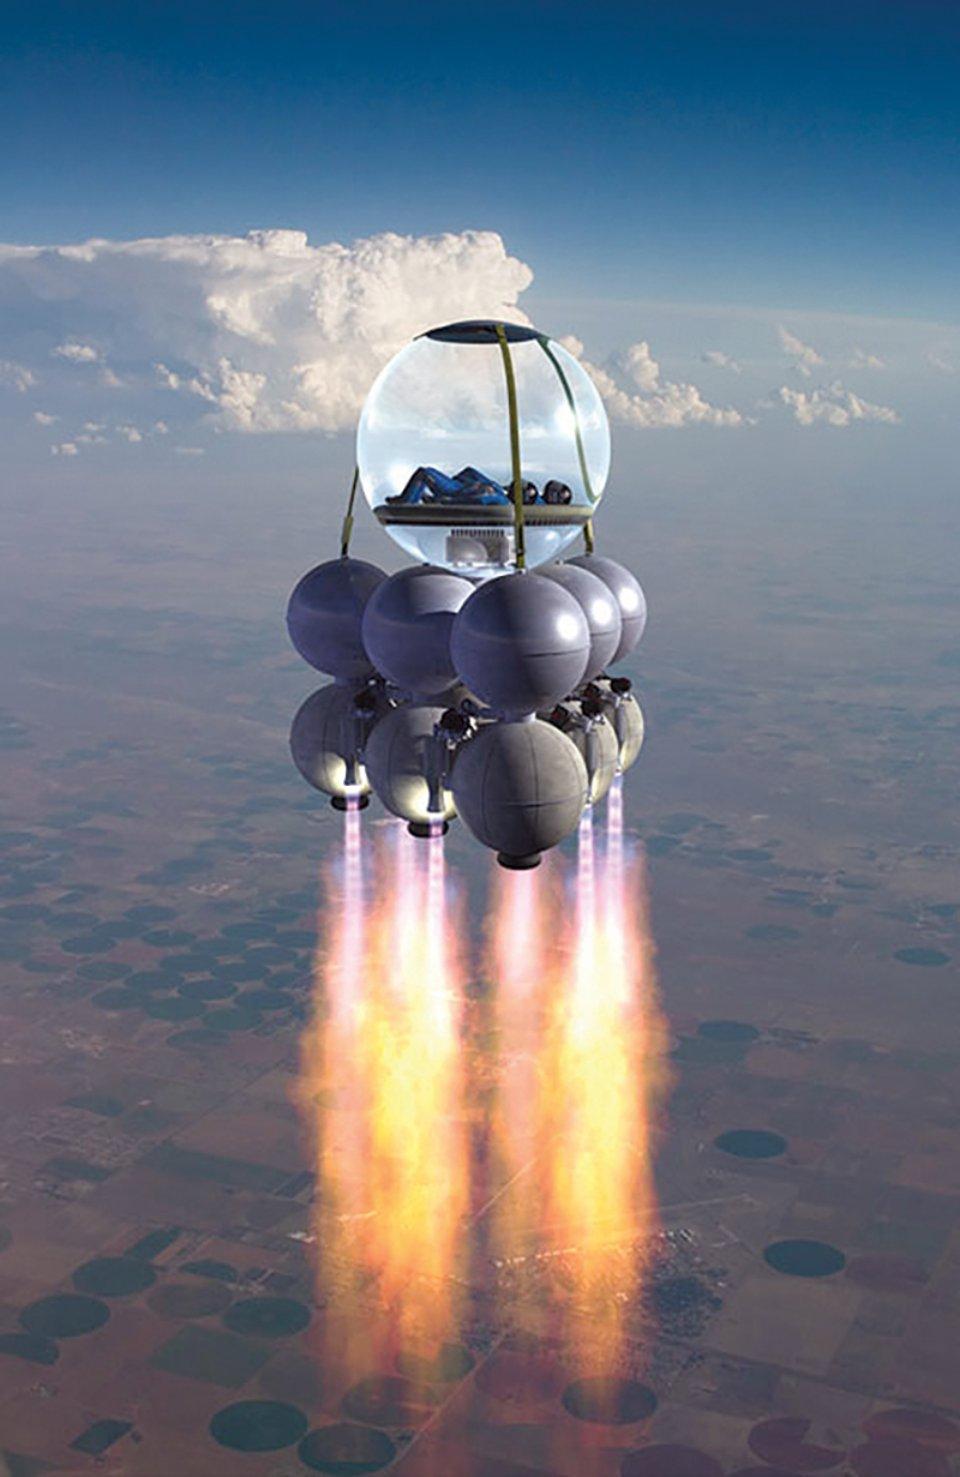 Космічний апарат Armadillo Aerospace